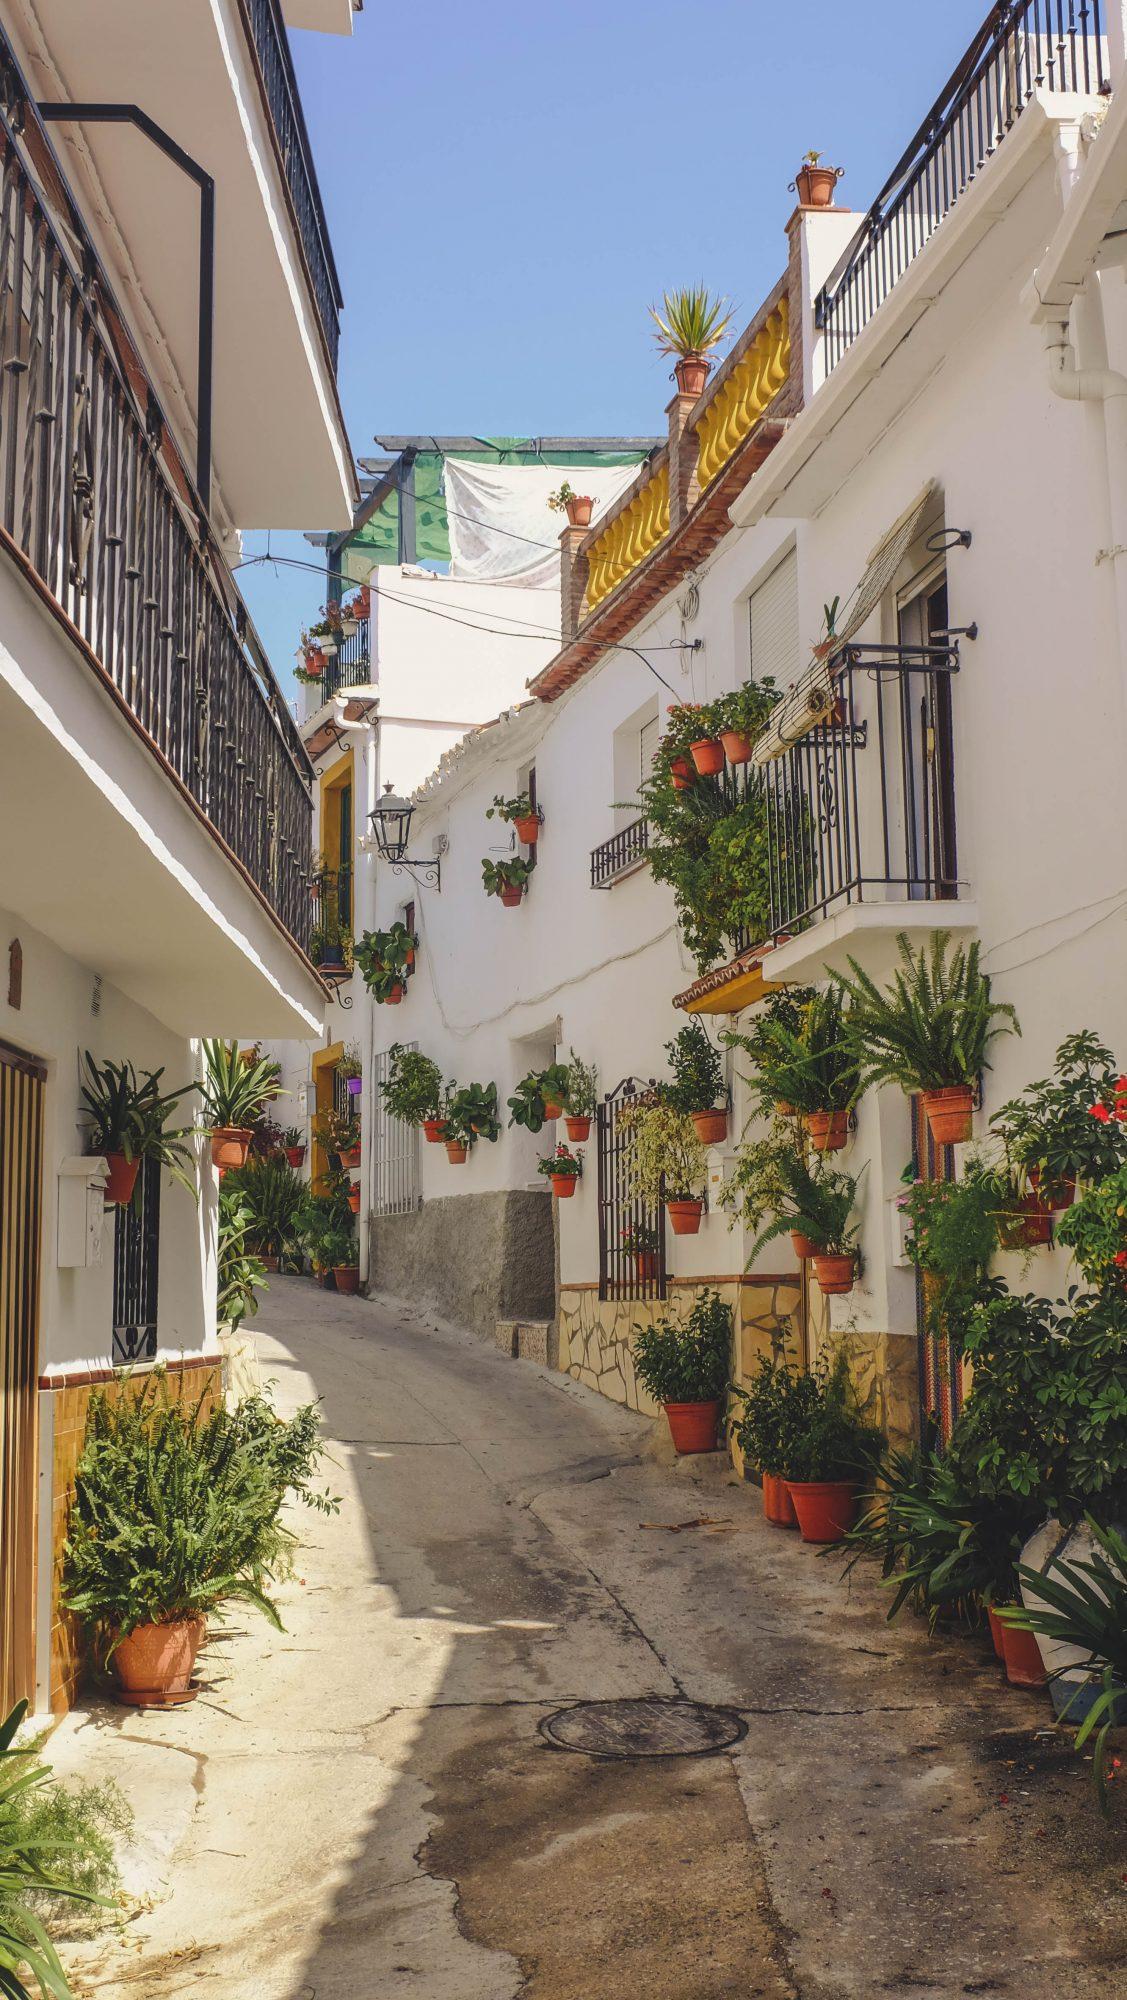 Canillas en fleur - Canillas de Aceituno, Espagne